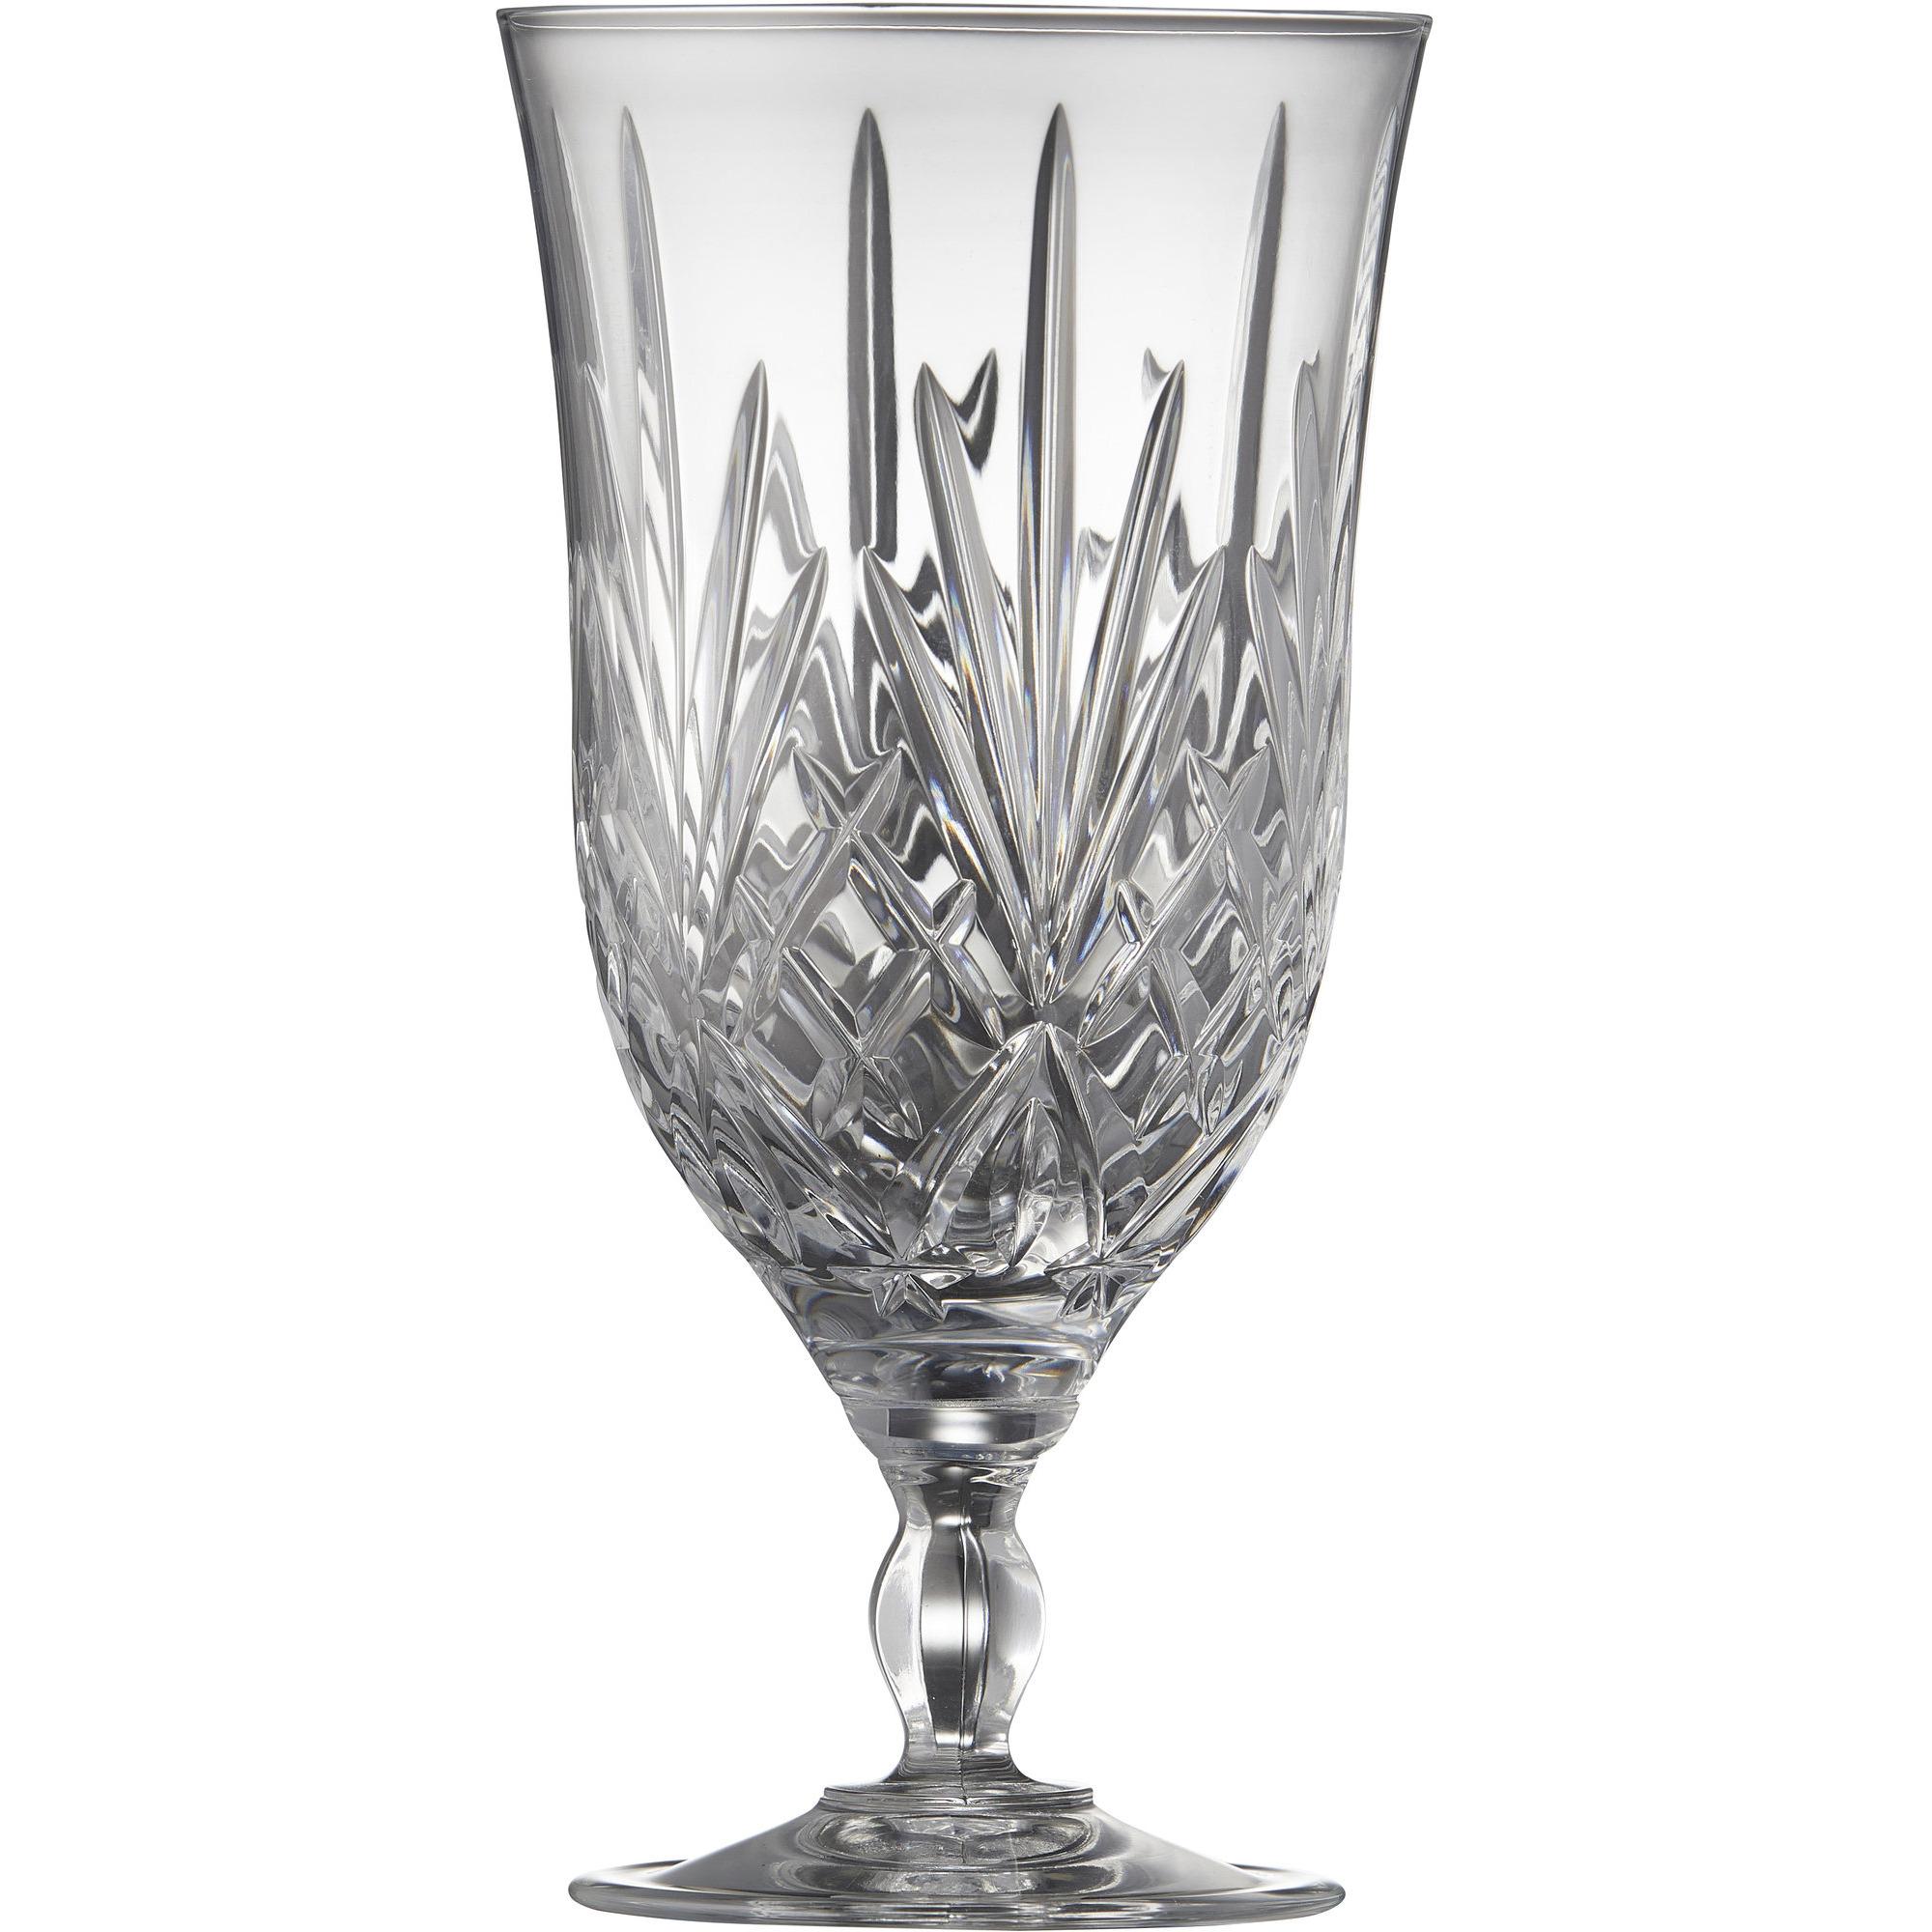 Lyngby Glas Melodia Ölglas 4 st